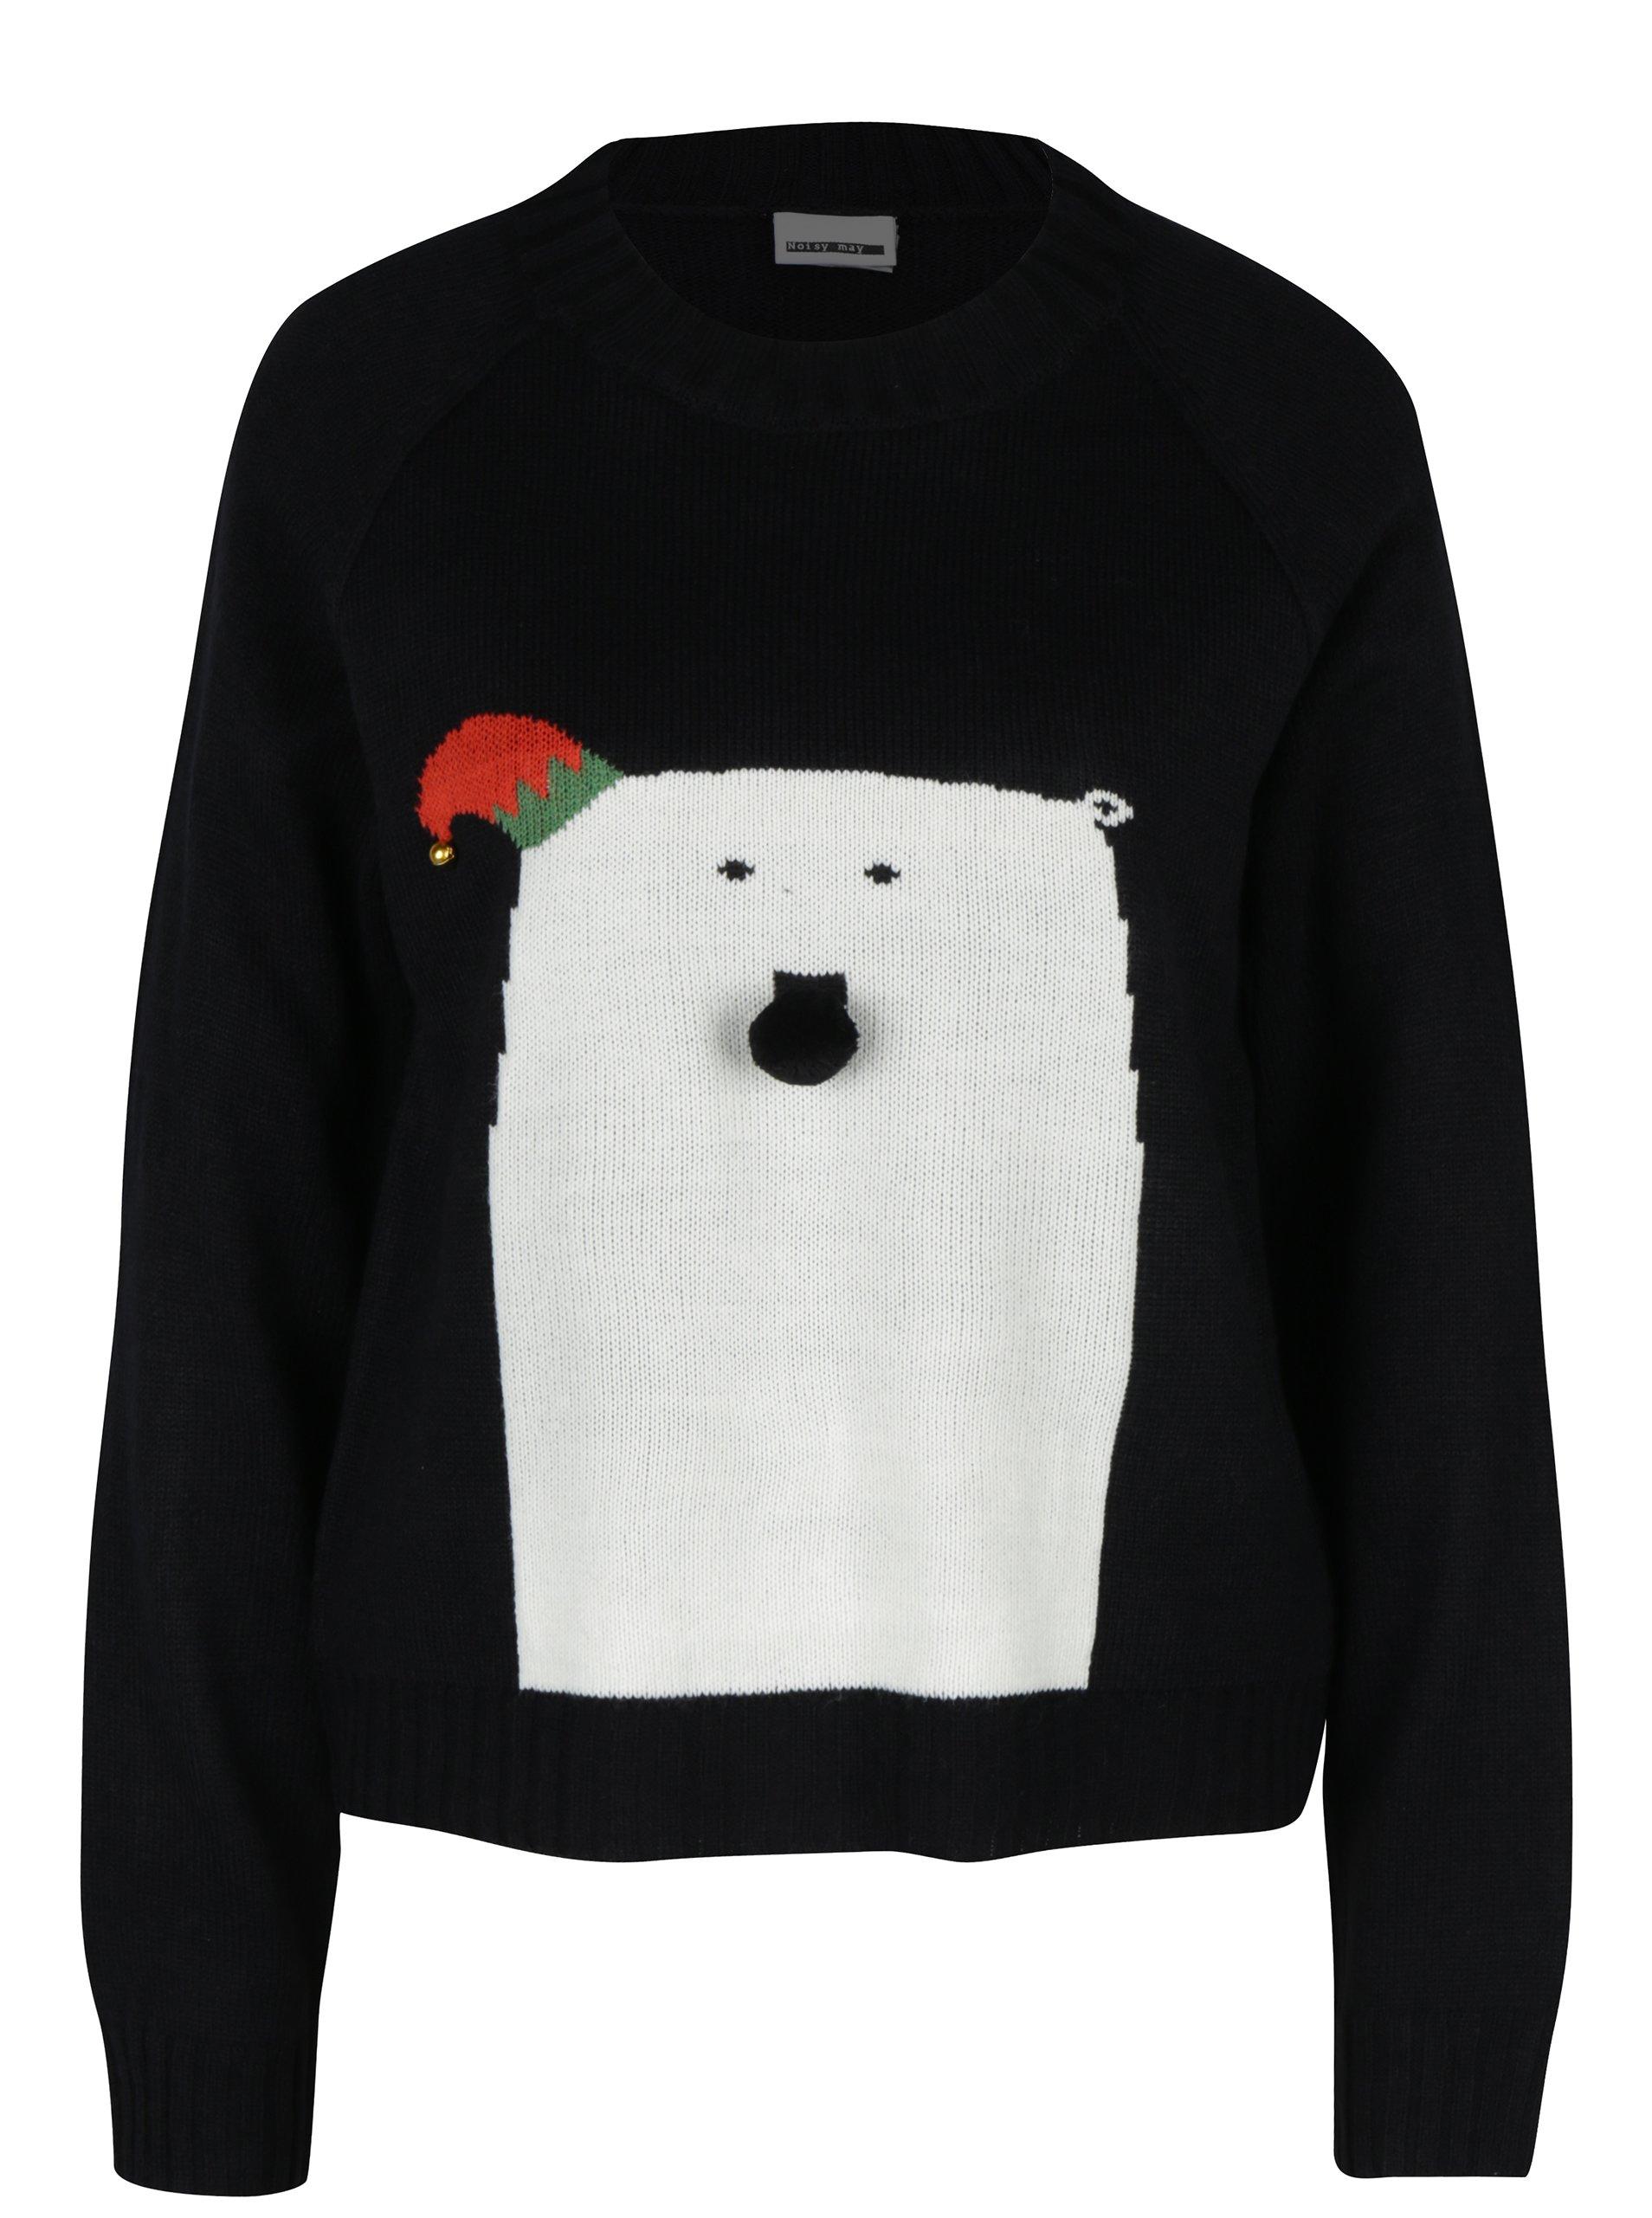 Černý svetr s motivem medvěda Noisy May Snow bear